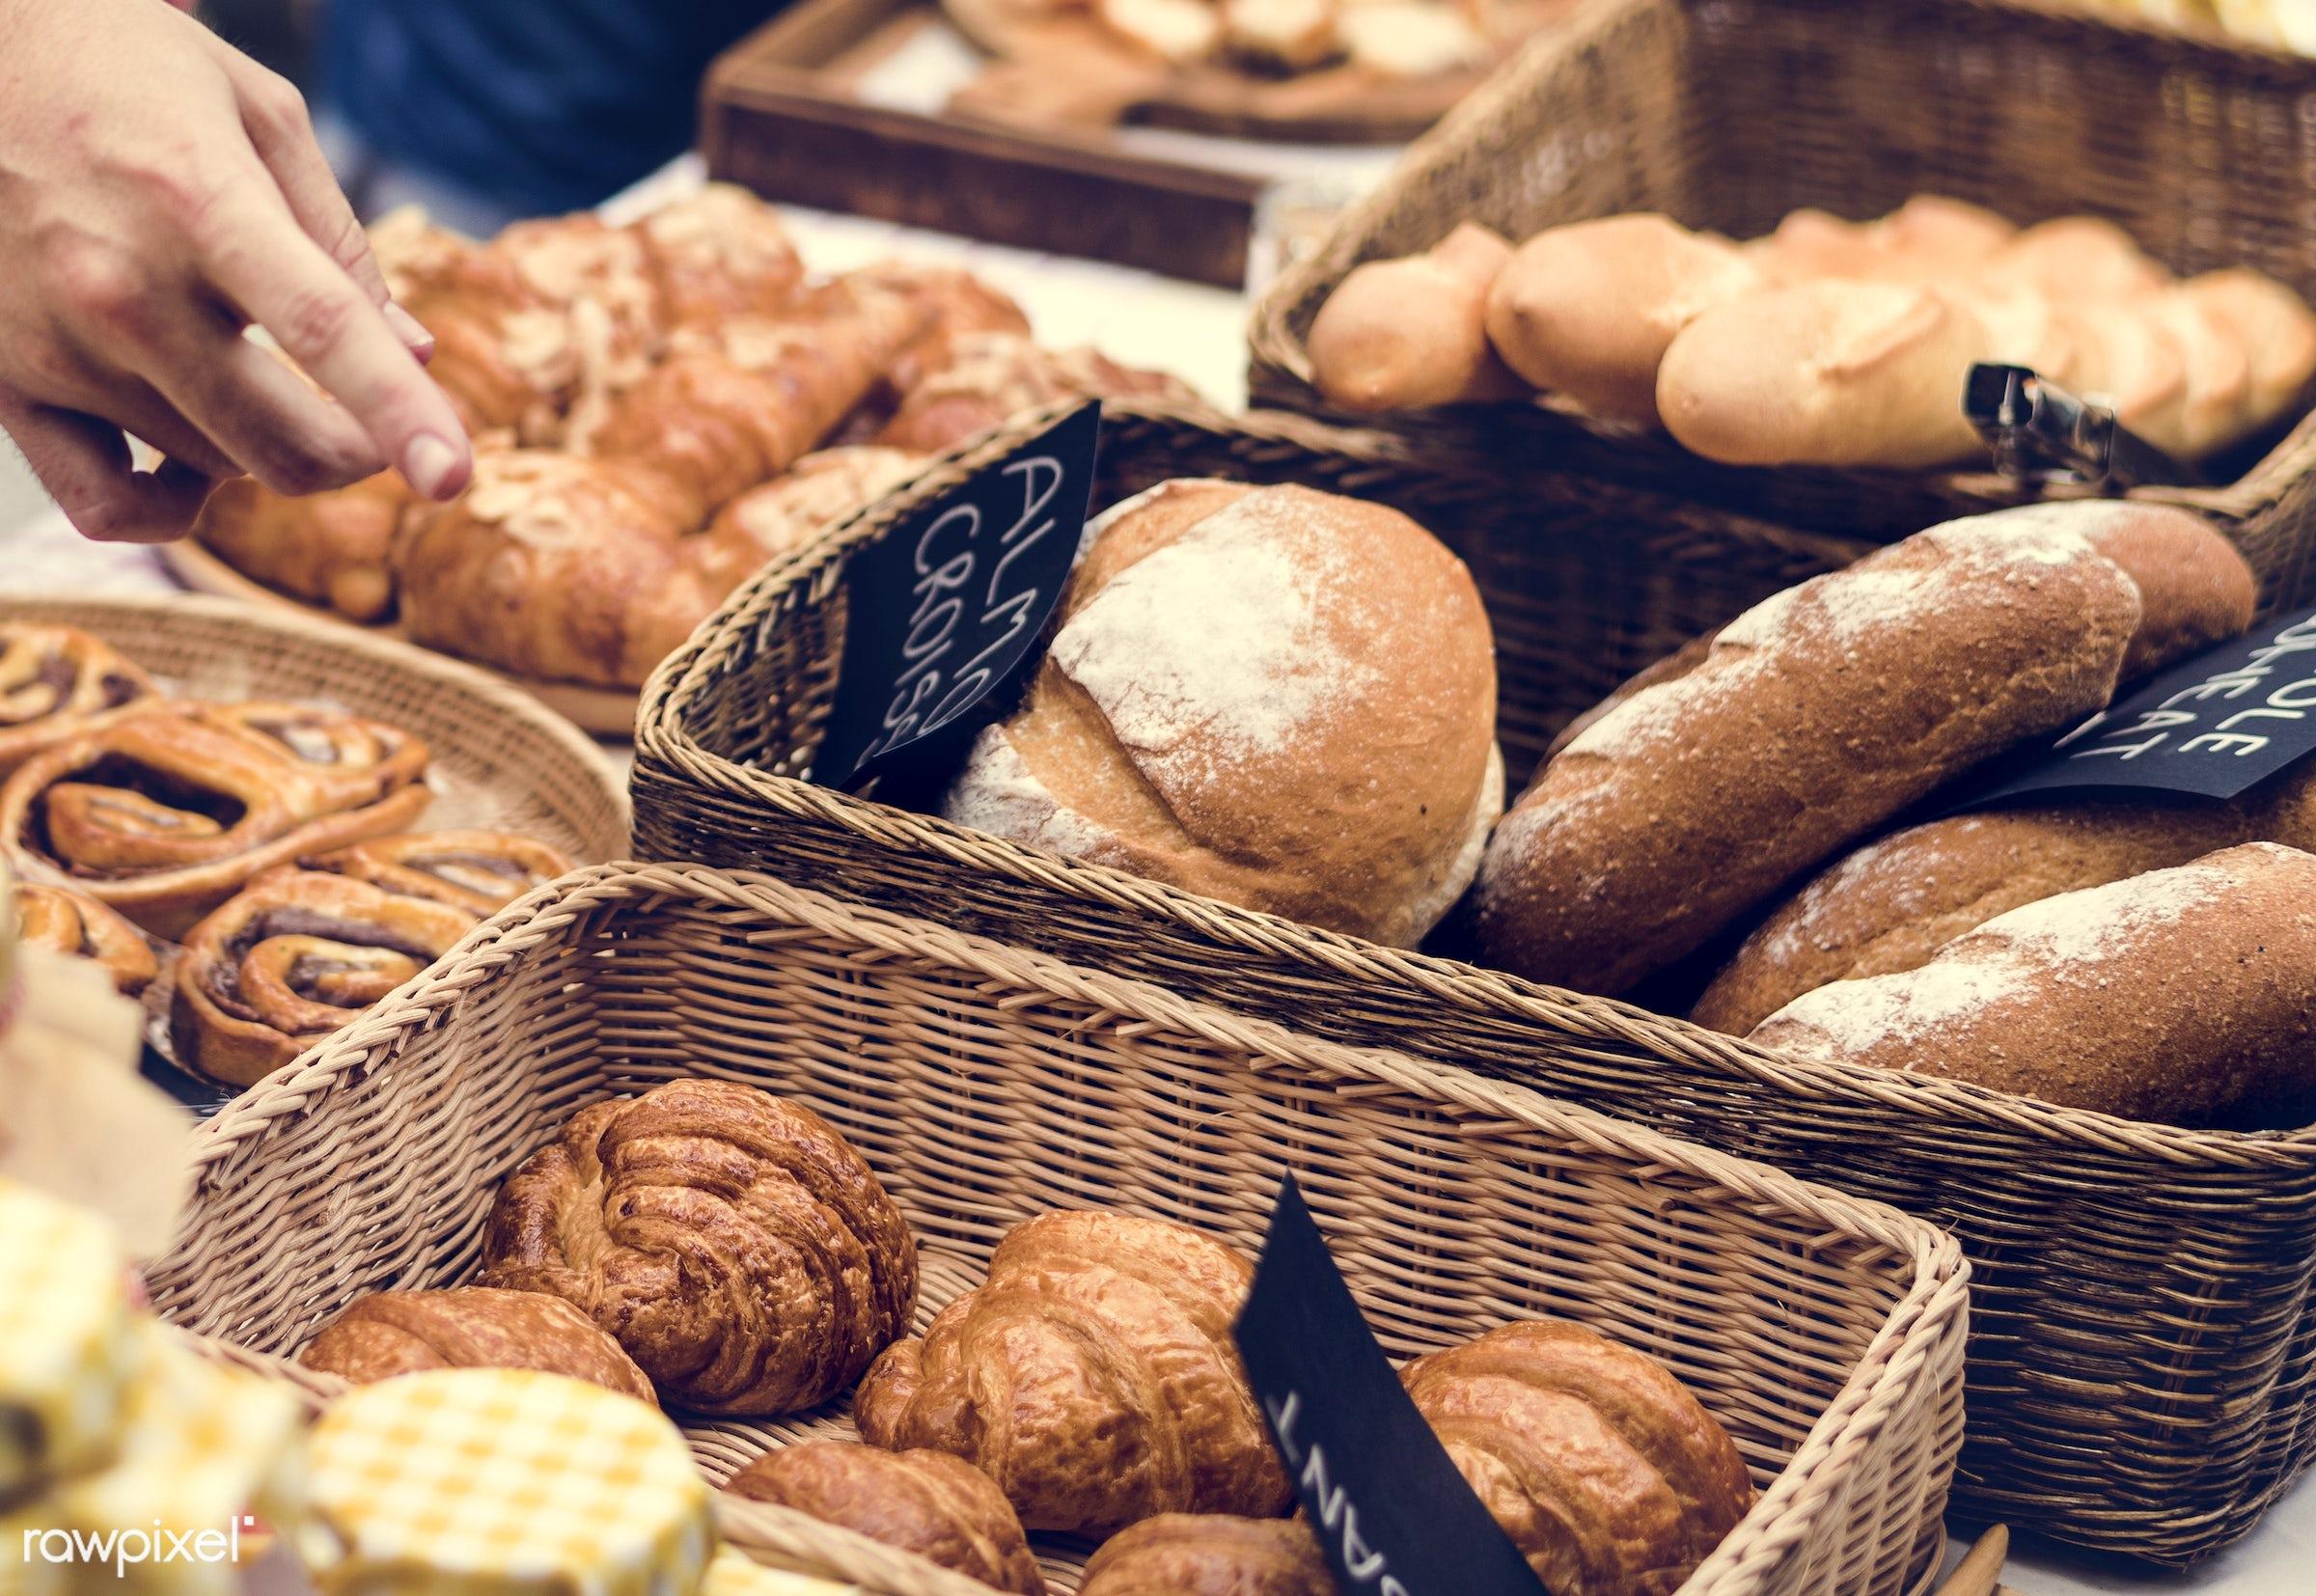 shop, cuisine, small business, variation, patissier, homemade, bread house, baked, bakery, dough, bread, gourmet, dessert,...